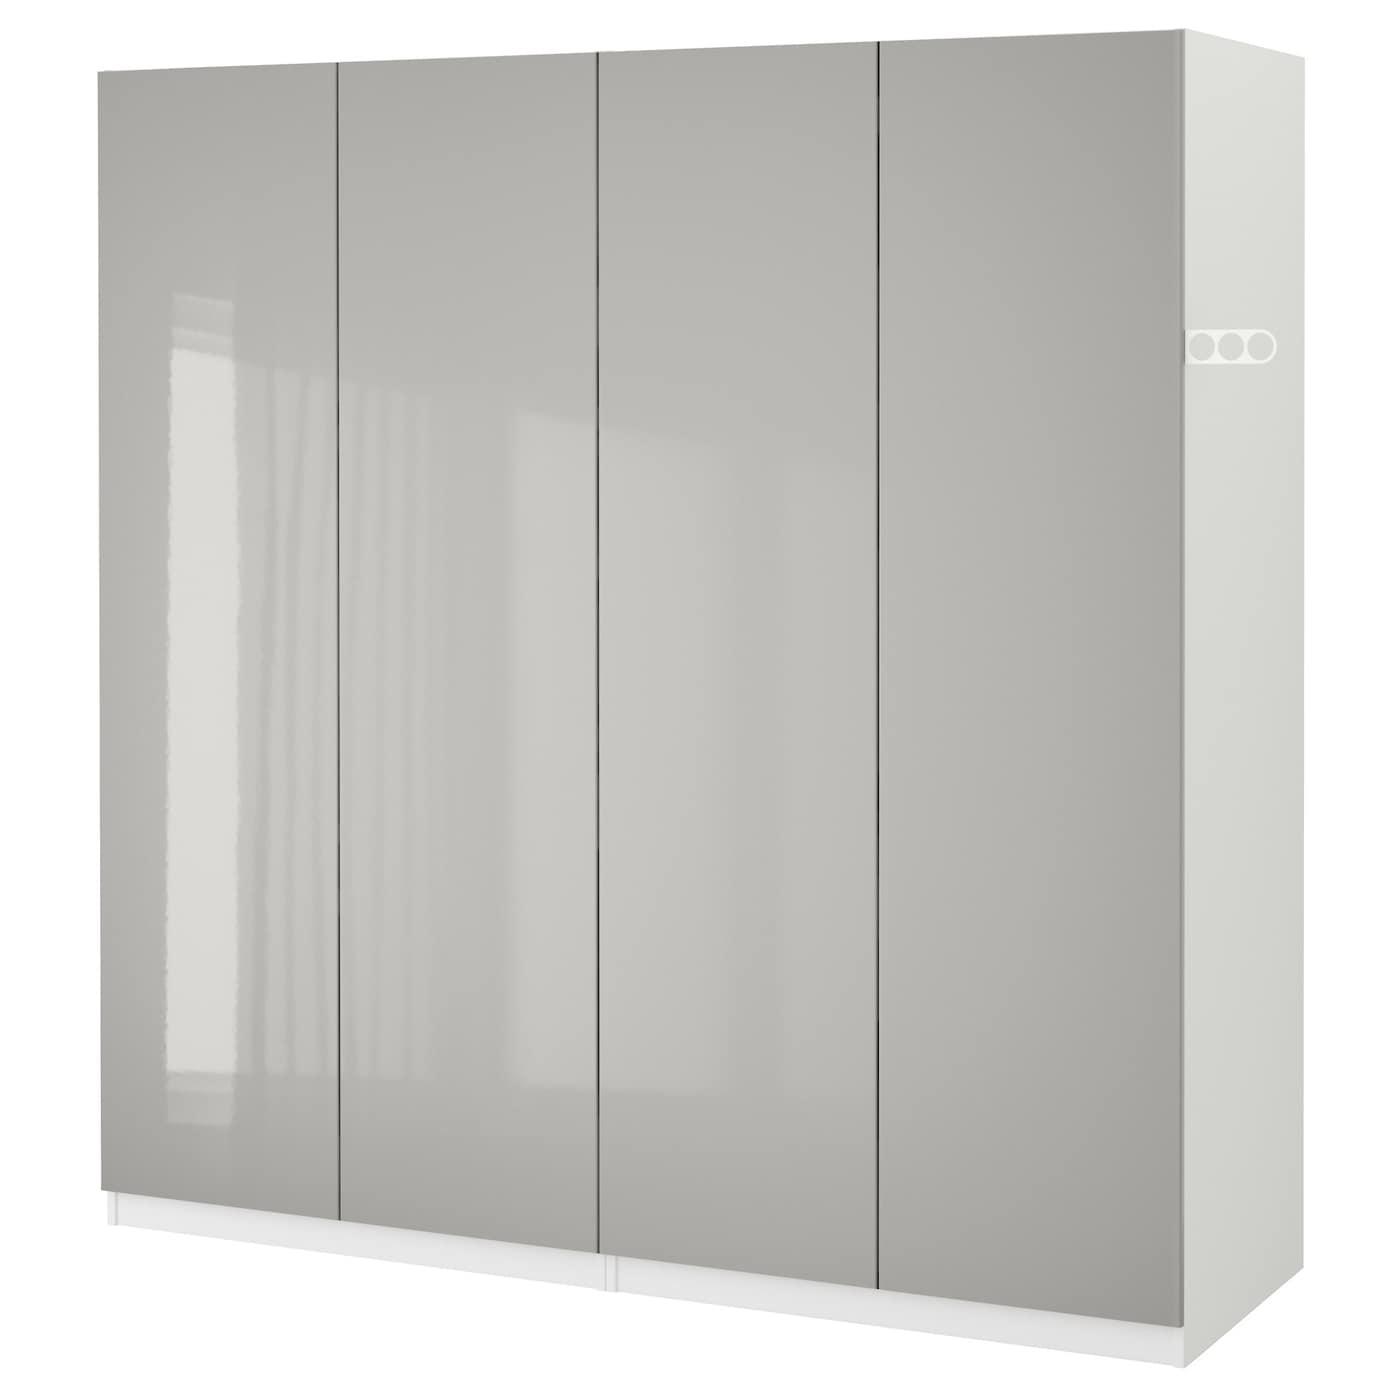 Pax wardrobe white fardal high gloss light grey 200x60x201 cm ikea - White armoire ikea ...